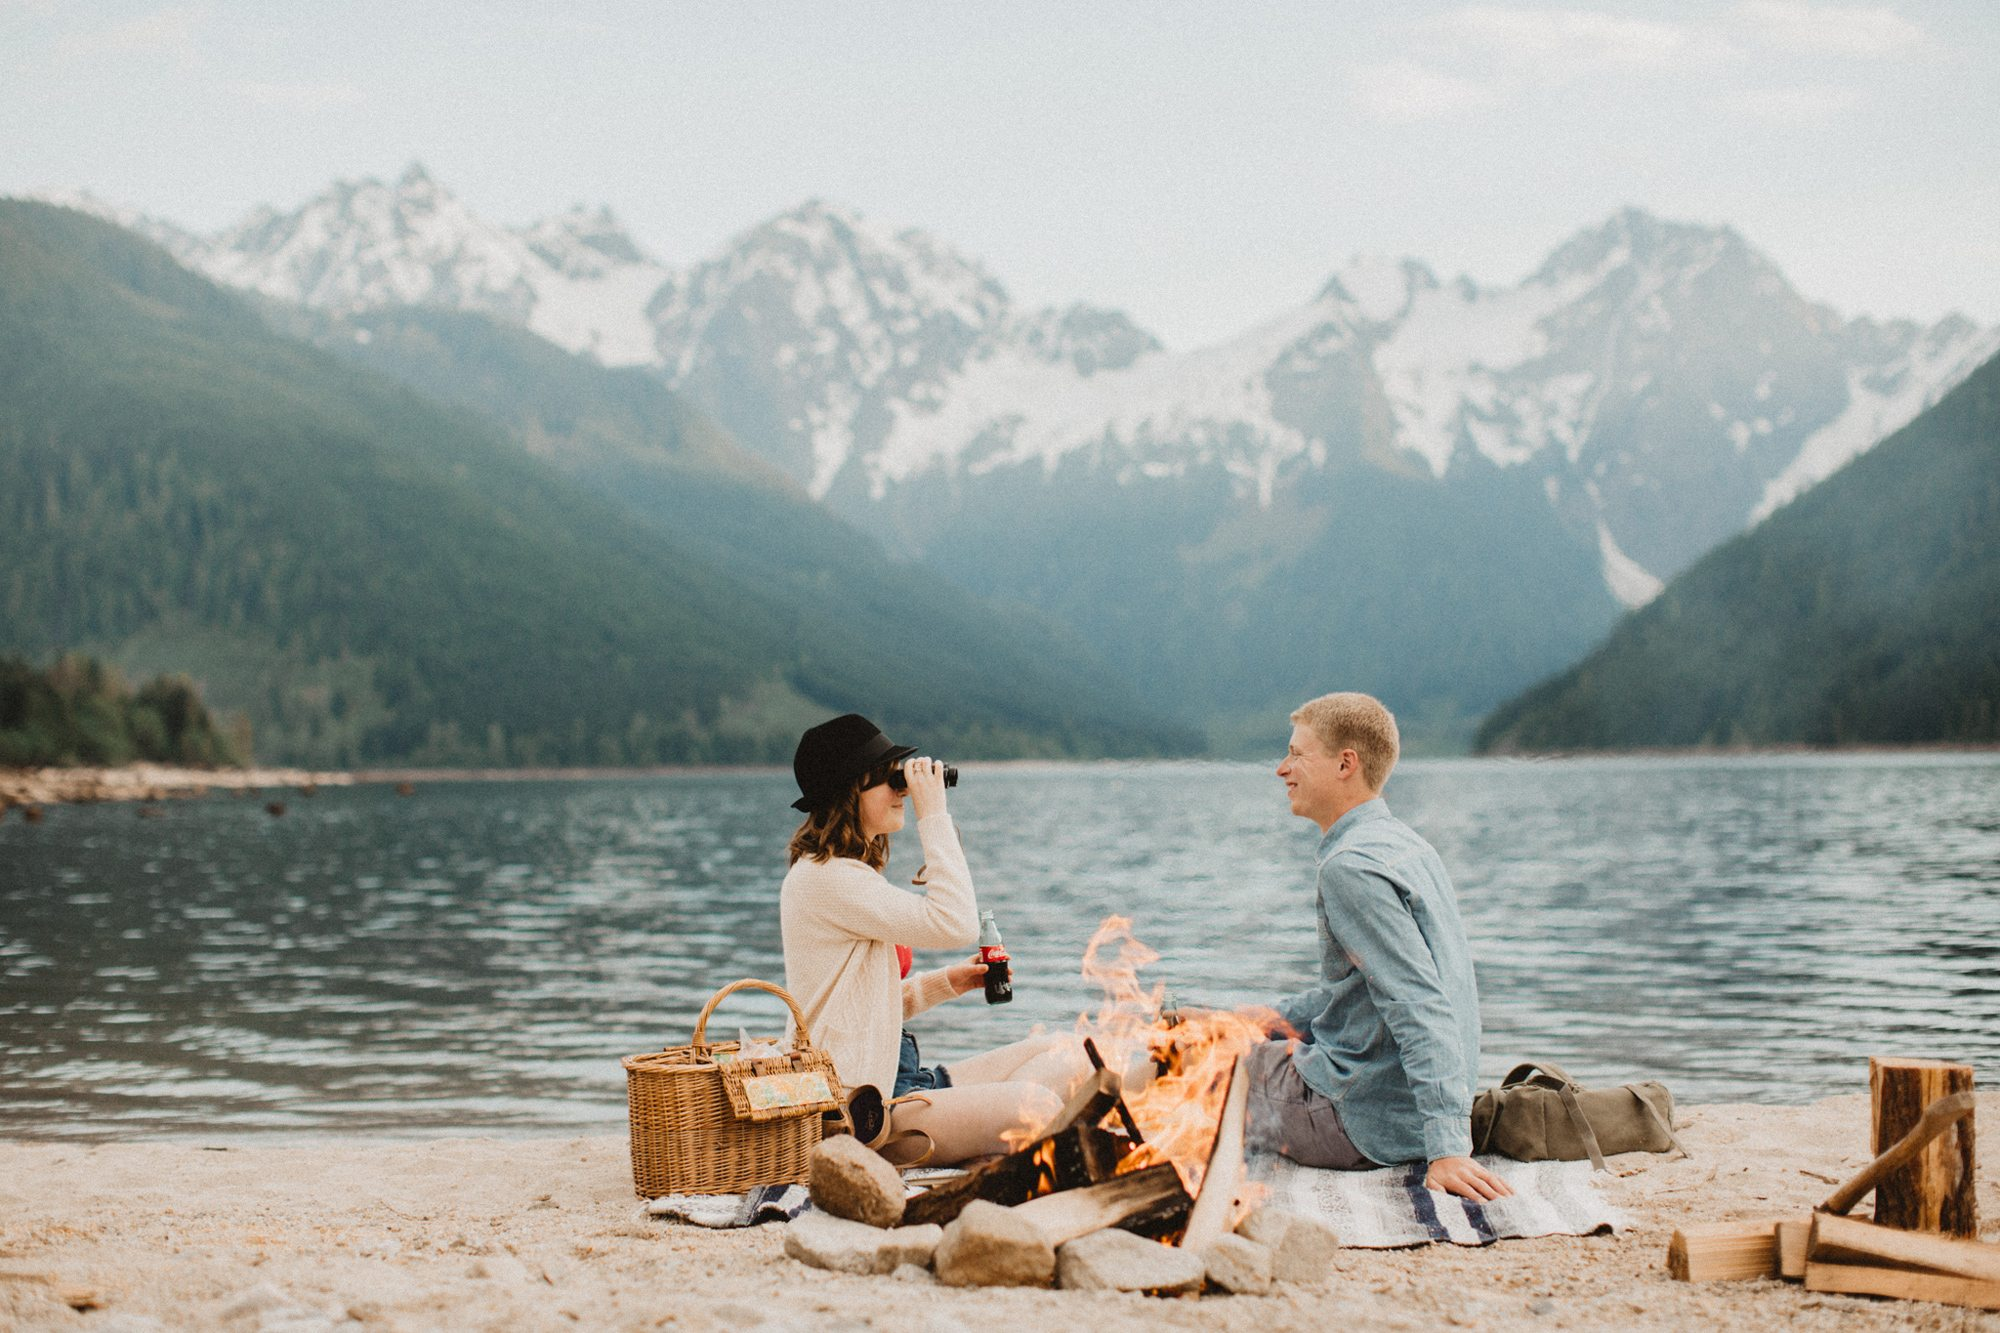 Trevor + Danielle  // Manning Park Engagement Photographer, Luke Liable  // Victoria & Vancouver Island Wedding Photographer